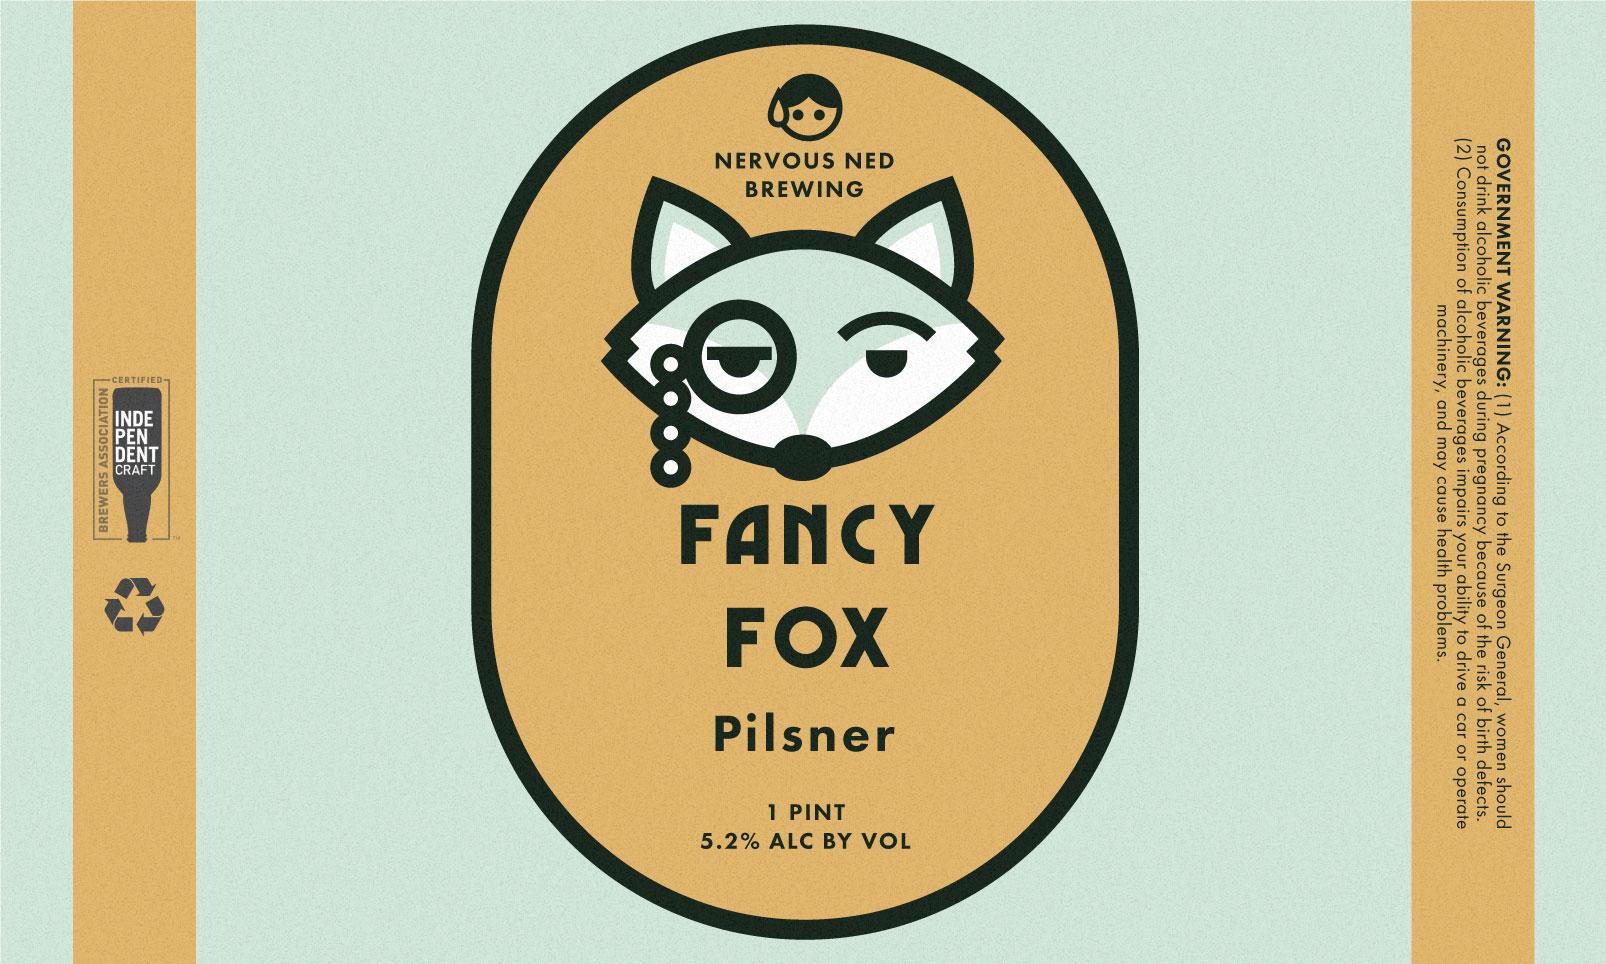 fancyfox